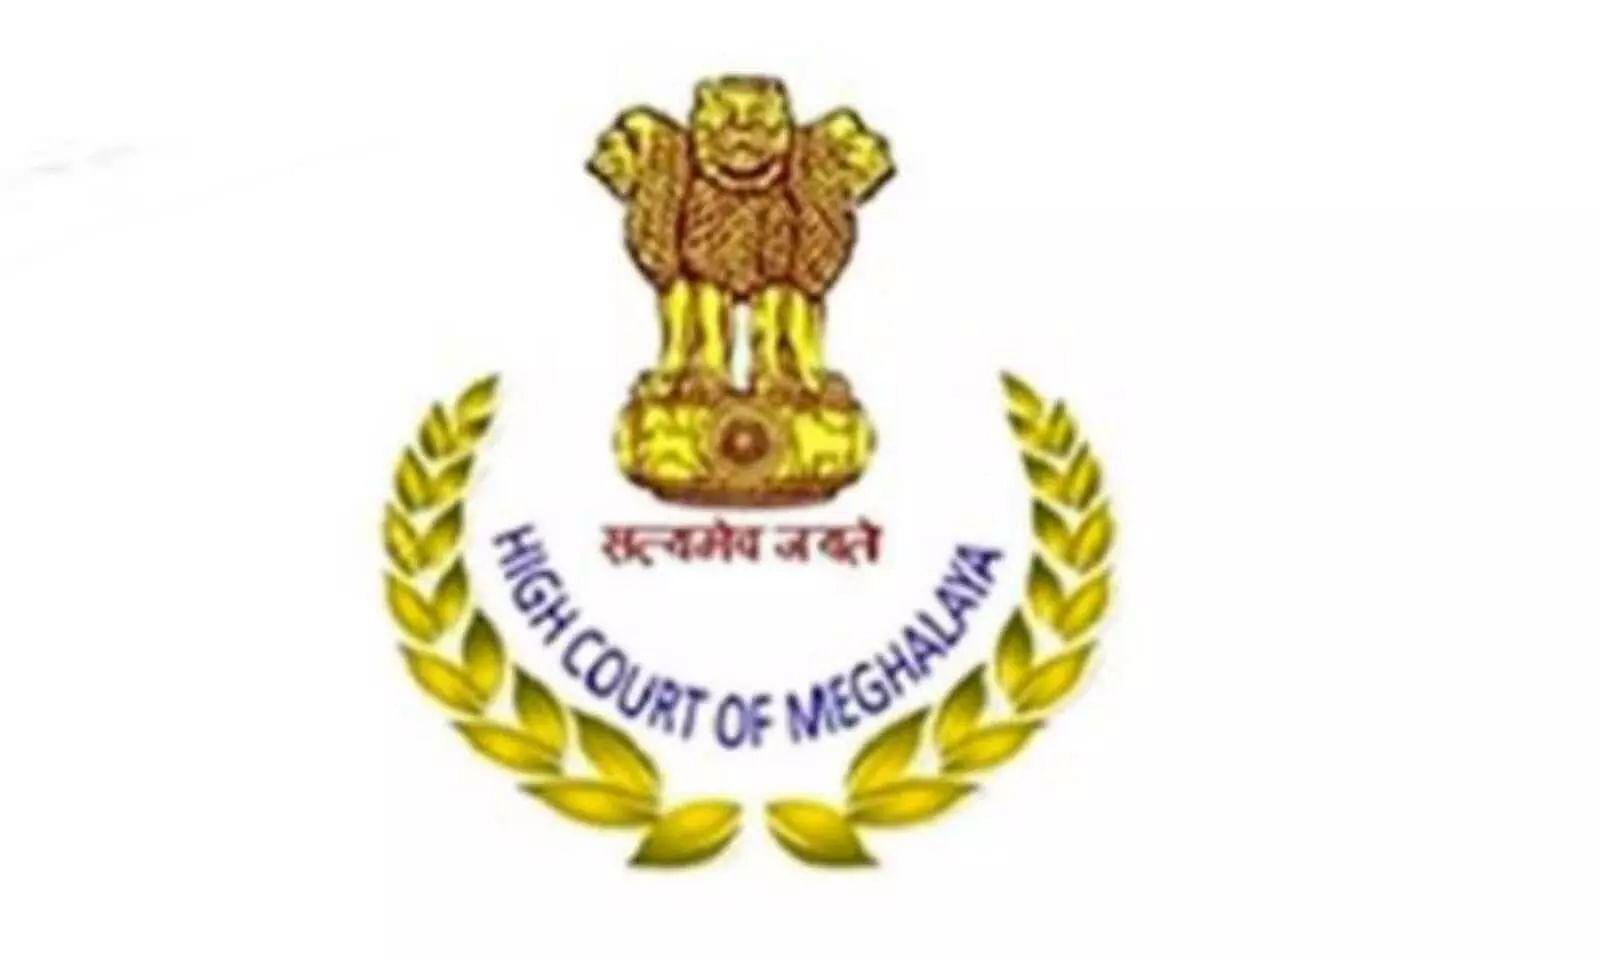 High Court Meghalaya